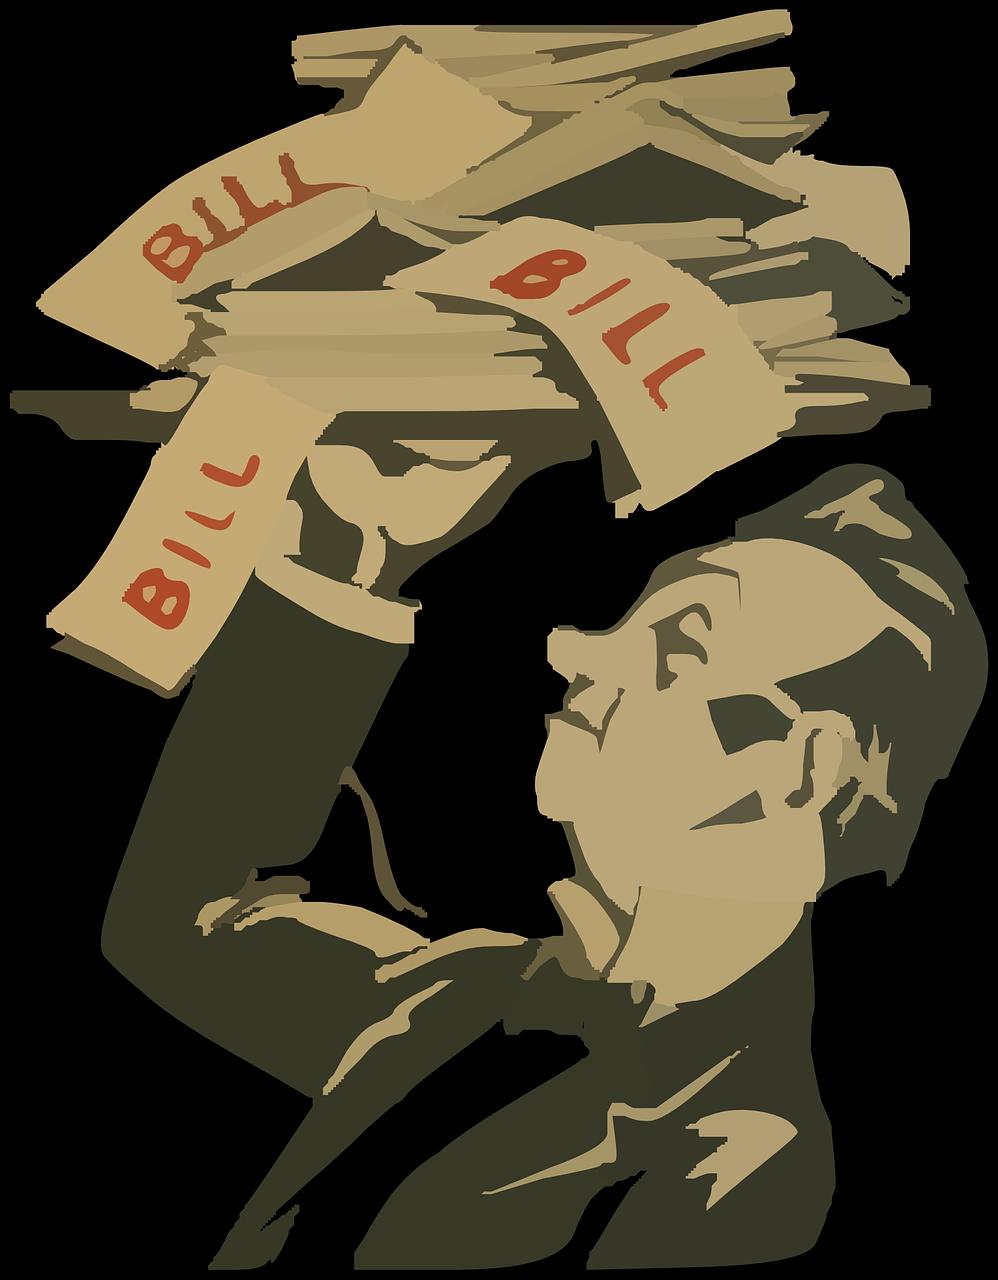 Has There Been A Clue On Gilead's Remdesivir? - Seeking Alpha thumbnail